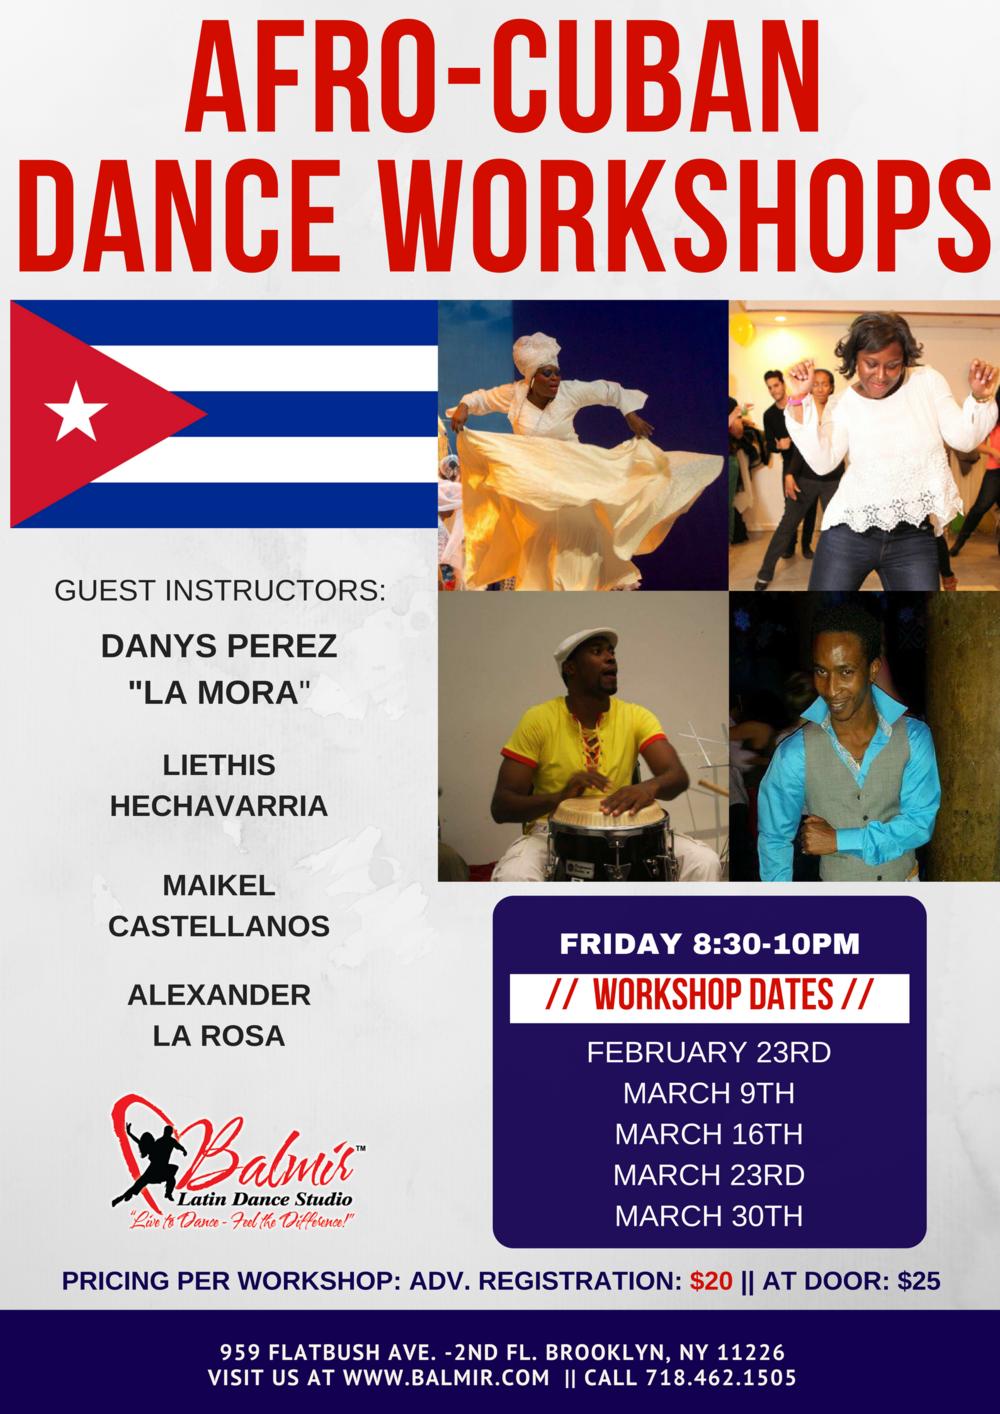 afro-Cuban dance workshops Balmir Latin Dance Studio